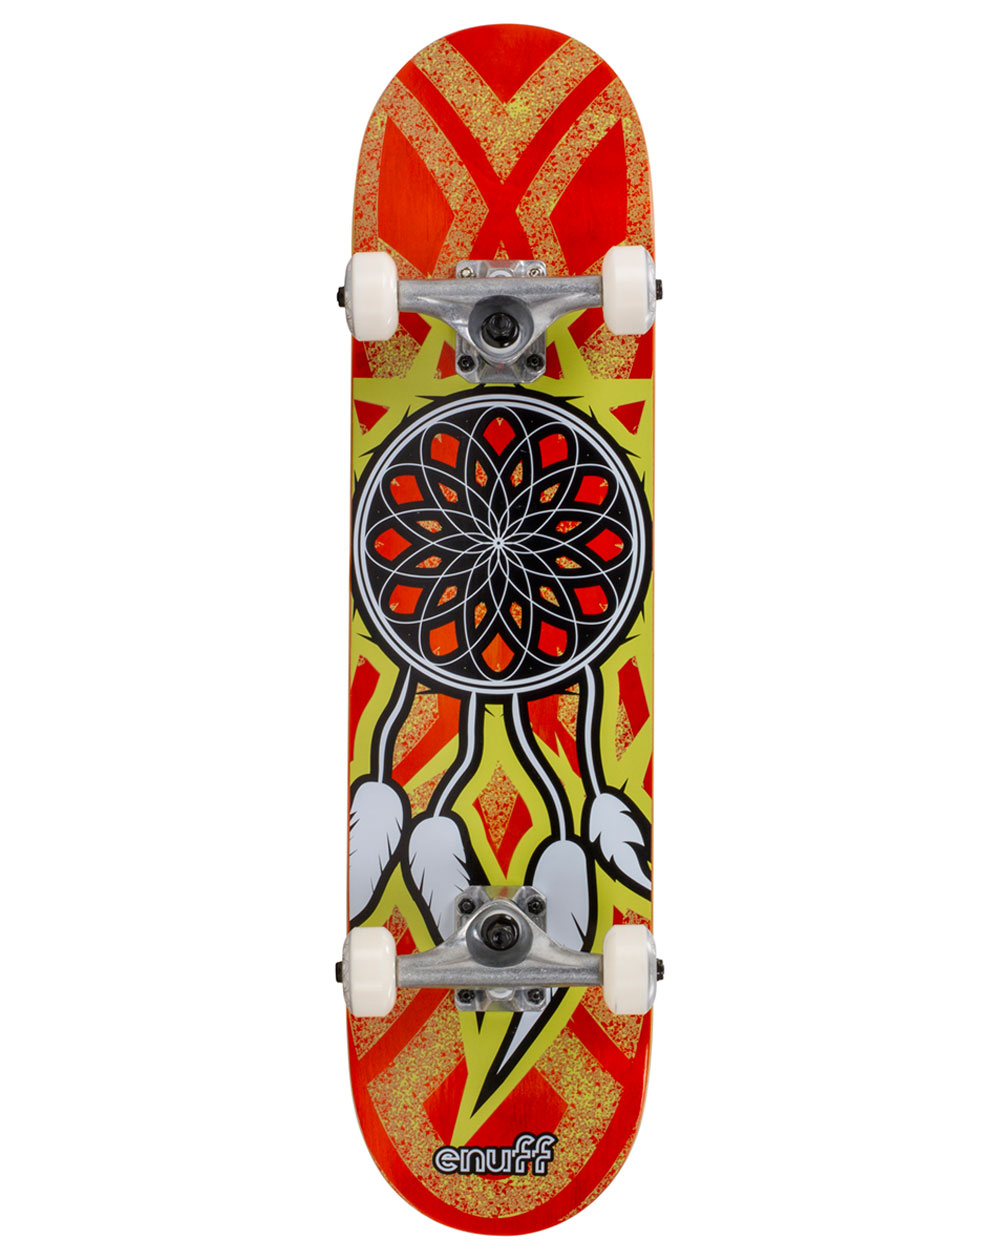 "Enuff Skateboard Complète Dreamcatcher 7.75"" Orange/Yellow"